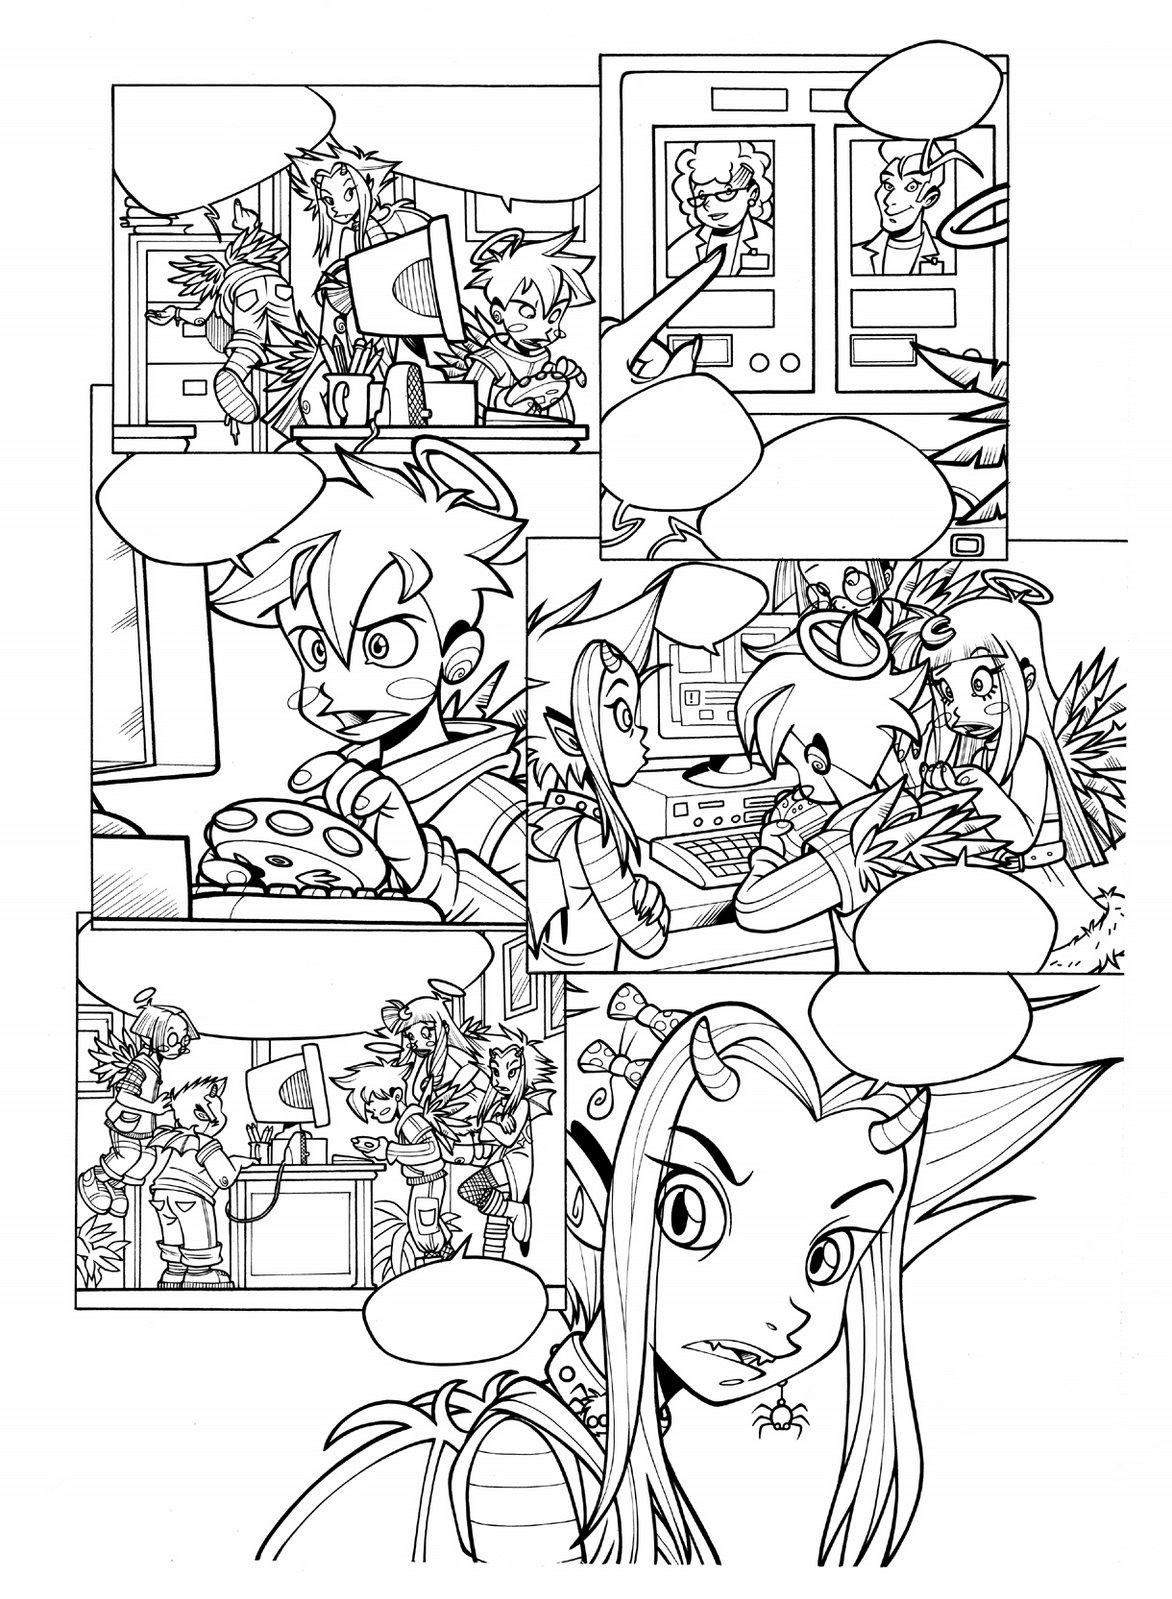 Рисовать комикс персонажей